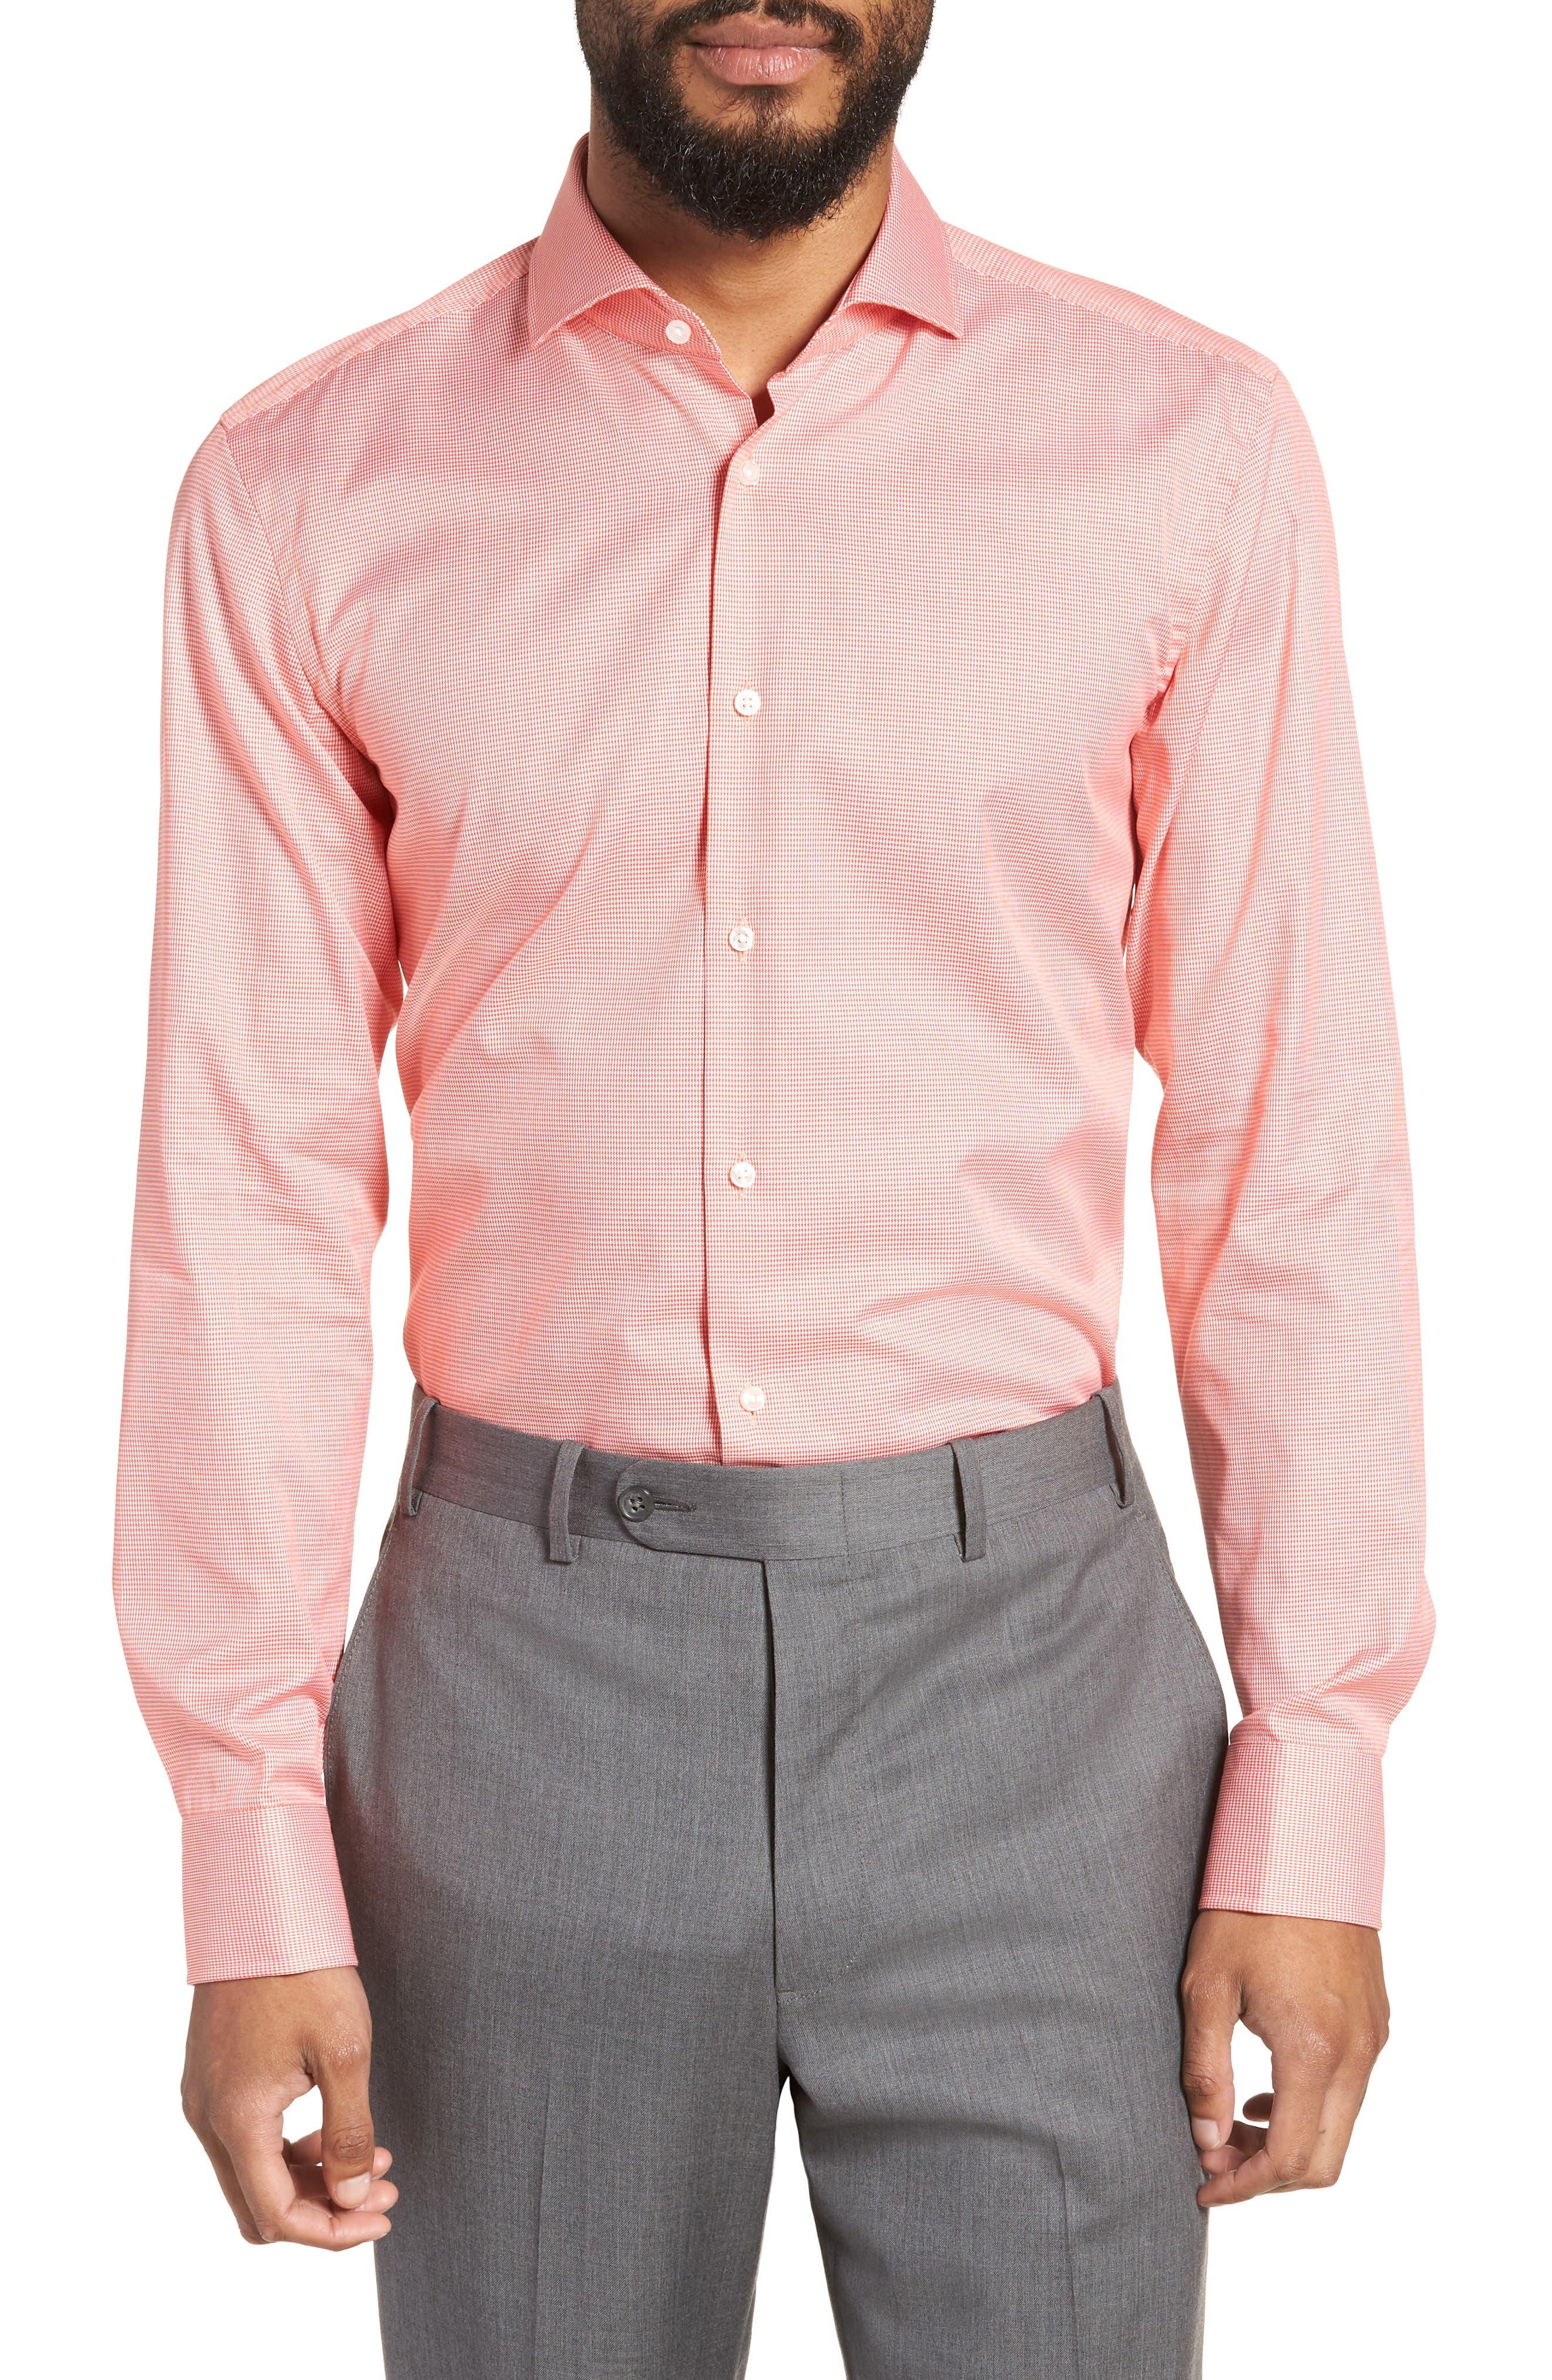 Jason Slim Fit Houndstooth Dress Shirt,                             Main thumbnail 1, color,                             813